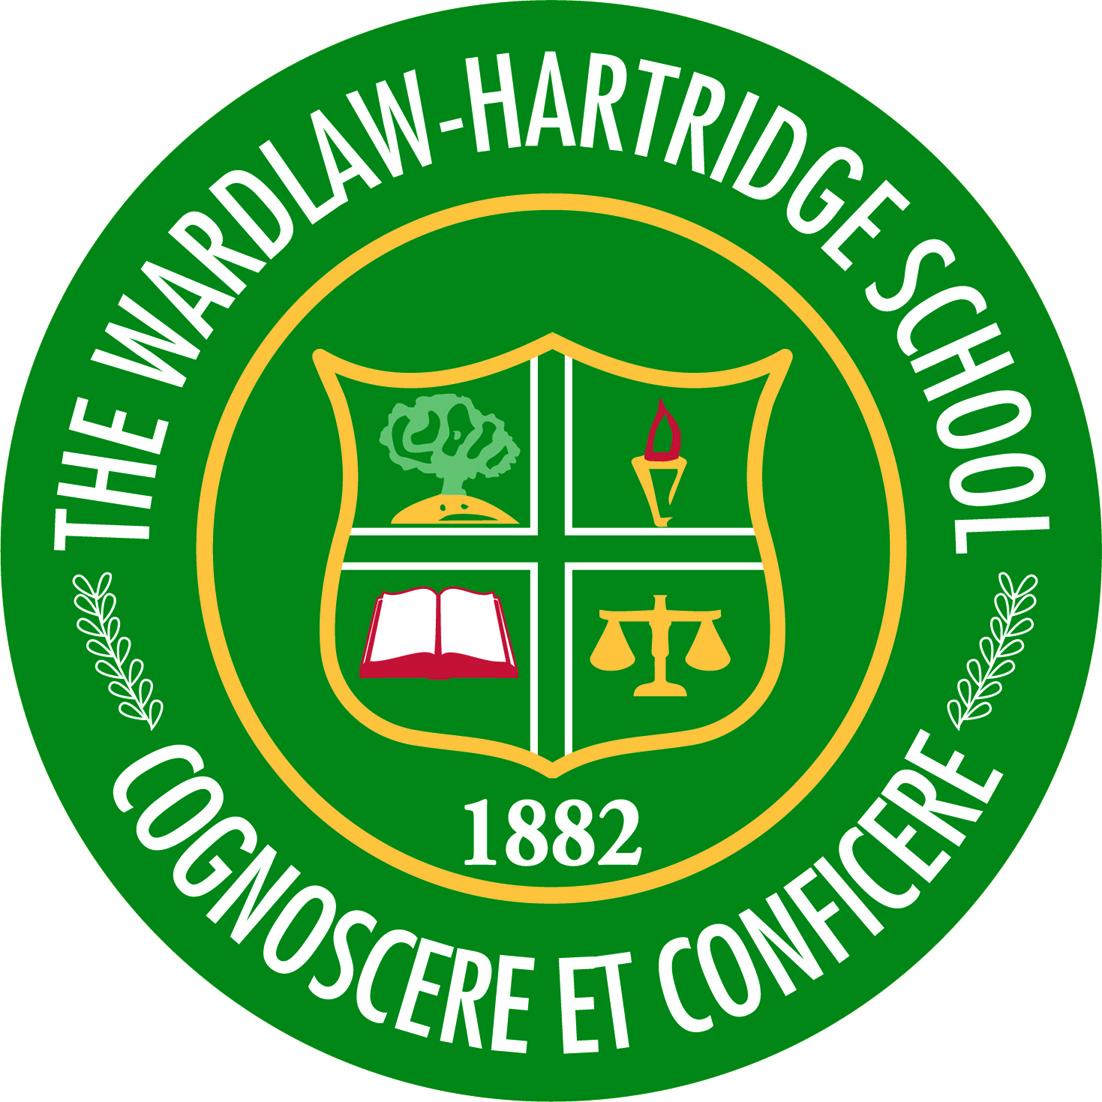 4f8b856b321ea43ccb22_Wardlaw_Hartridge_logo.jpg